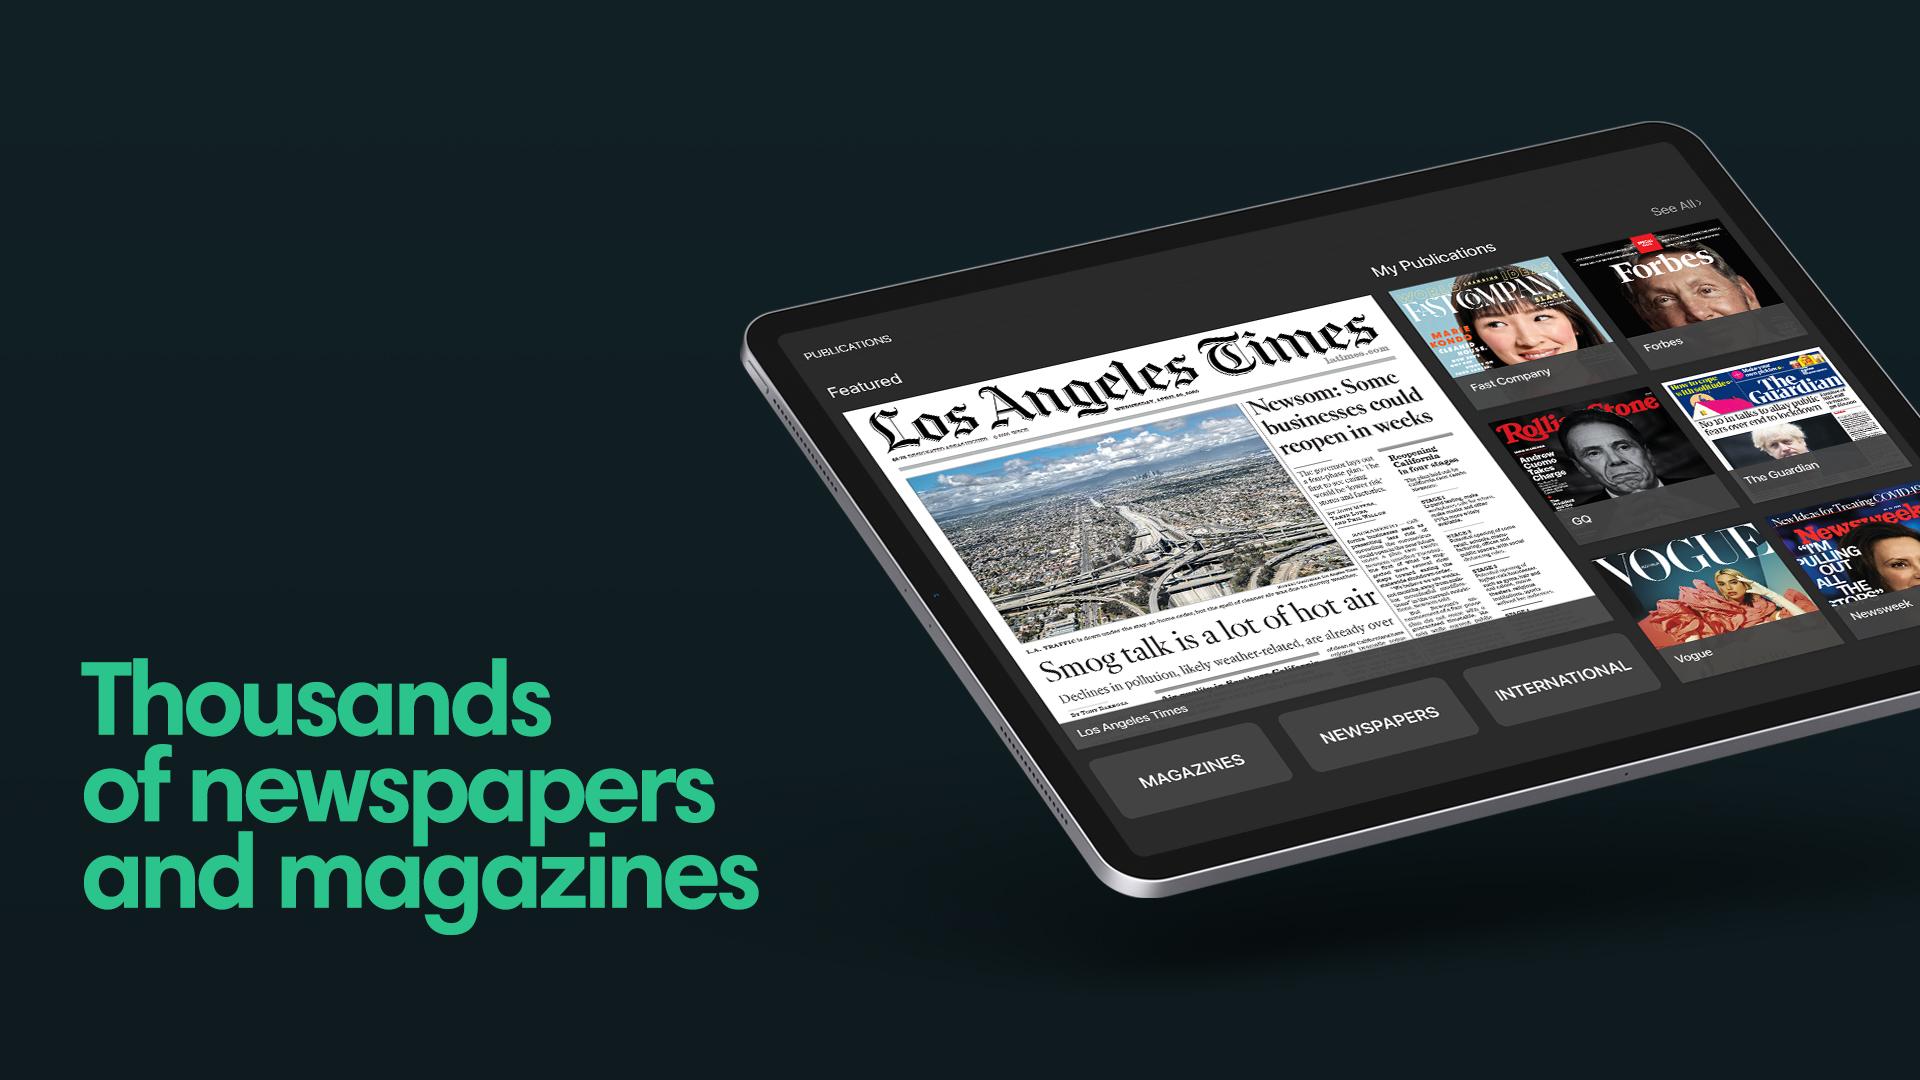 PressReader on iPad showing Los Angeles Times newspaper